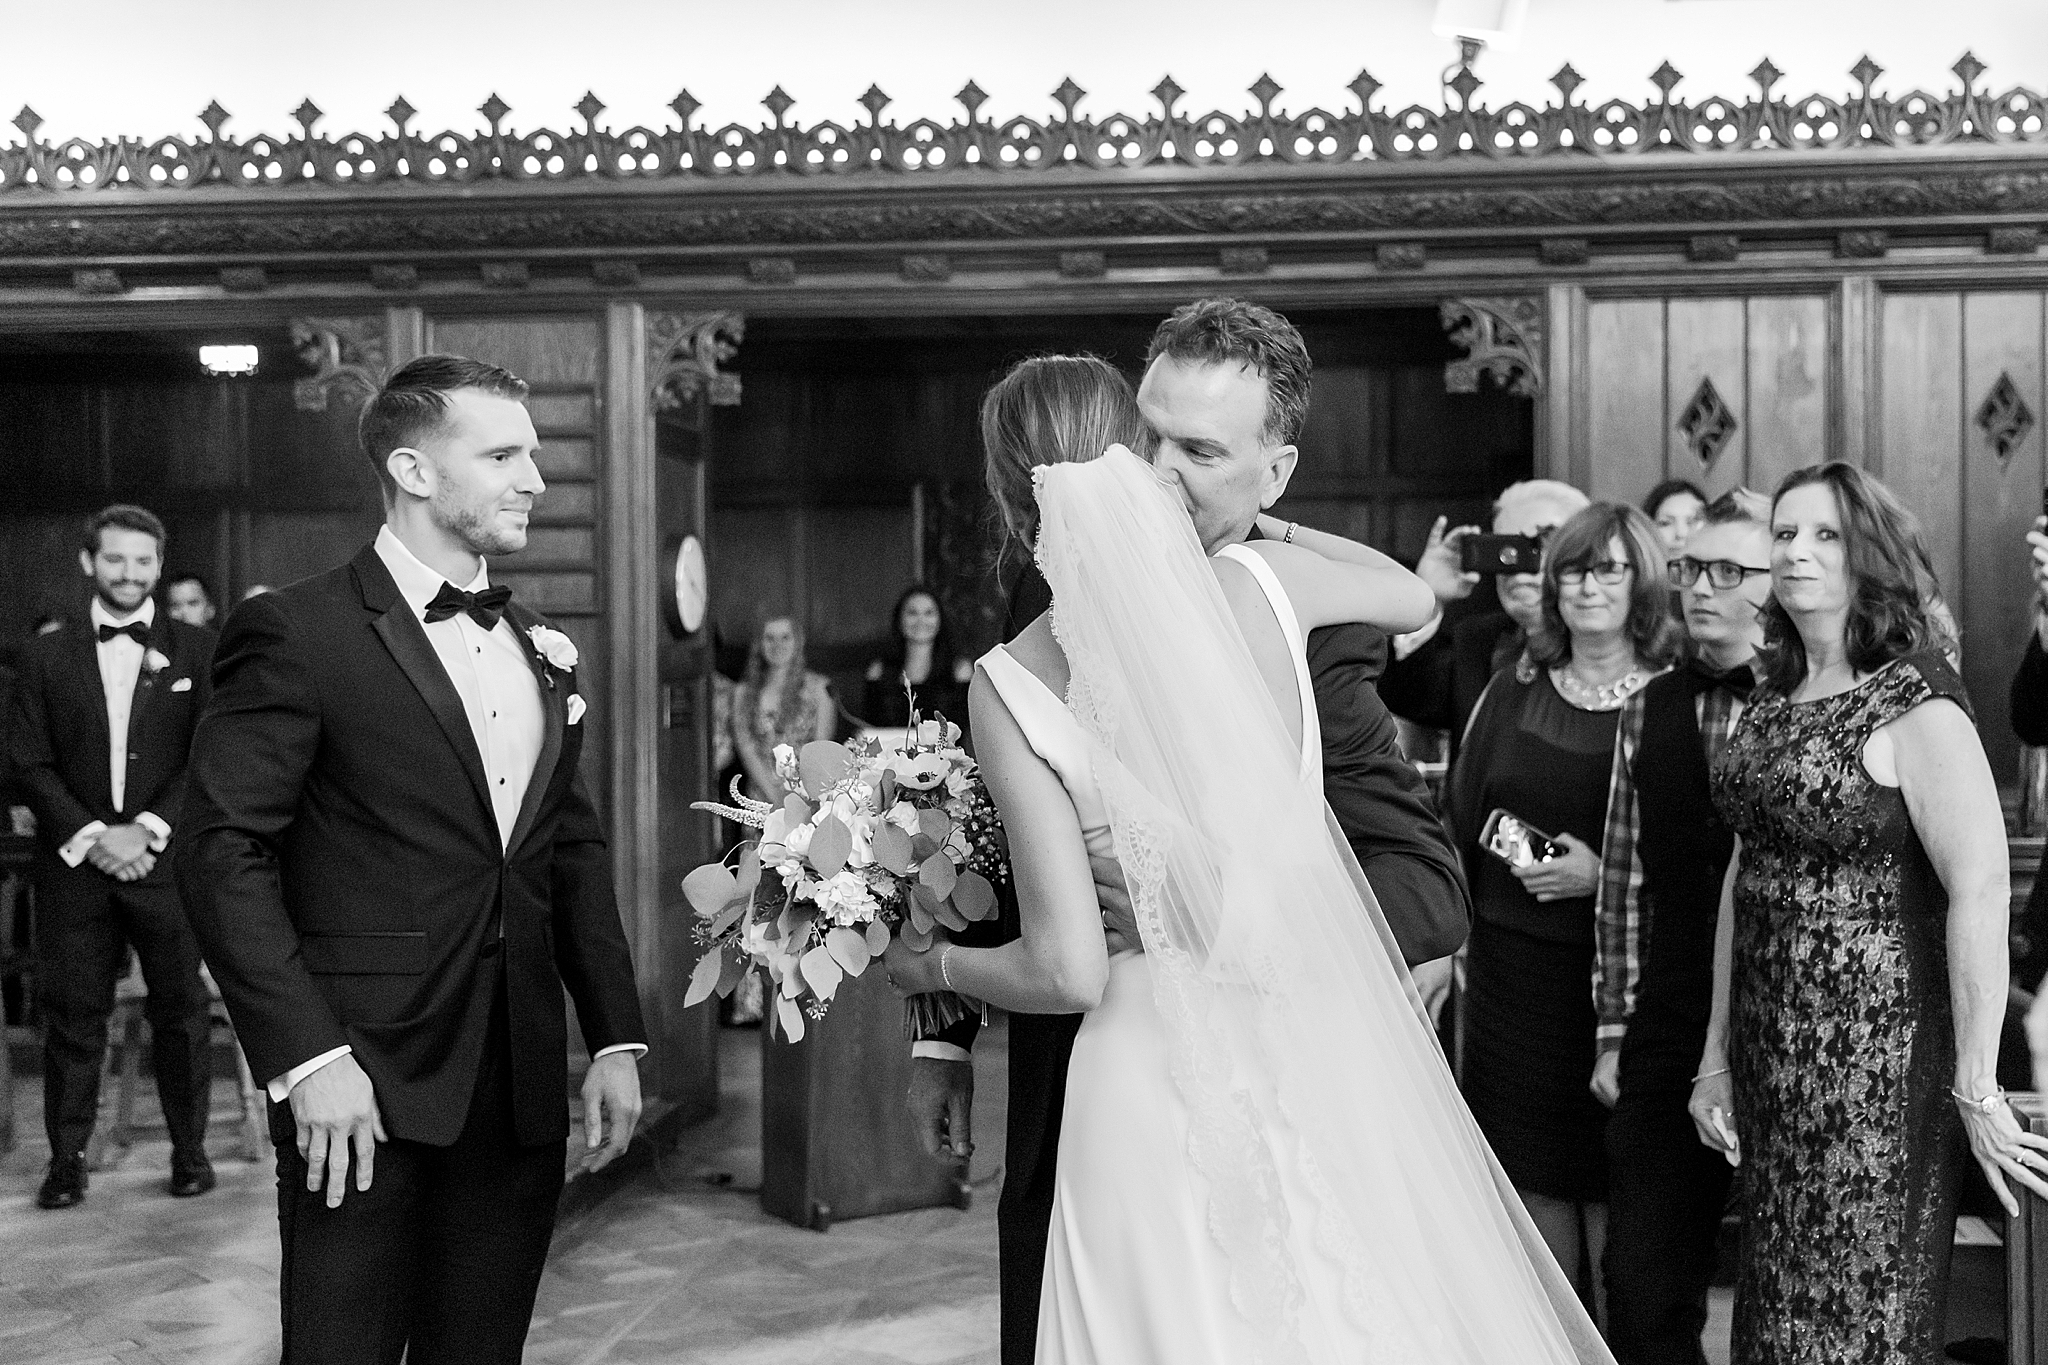 detroit-wedding-photographer-grosse-pointe-academy-chapel-detroit-golf-club-wedding-carly-matt-by-courtney-carolyn-photography_0037.jpg